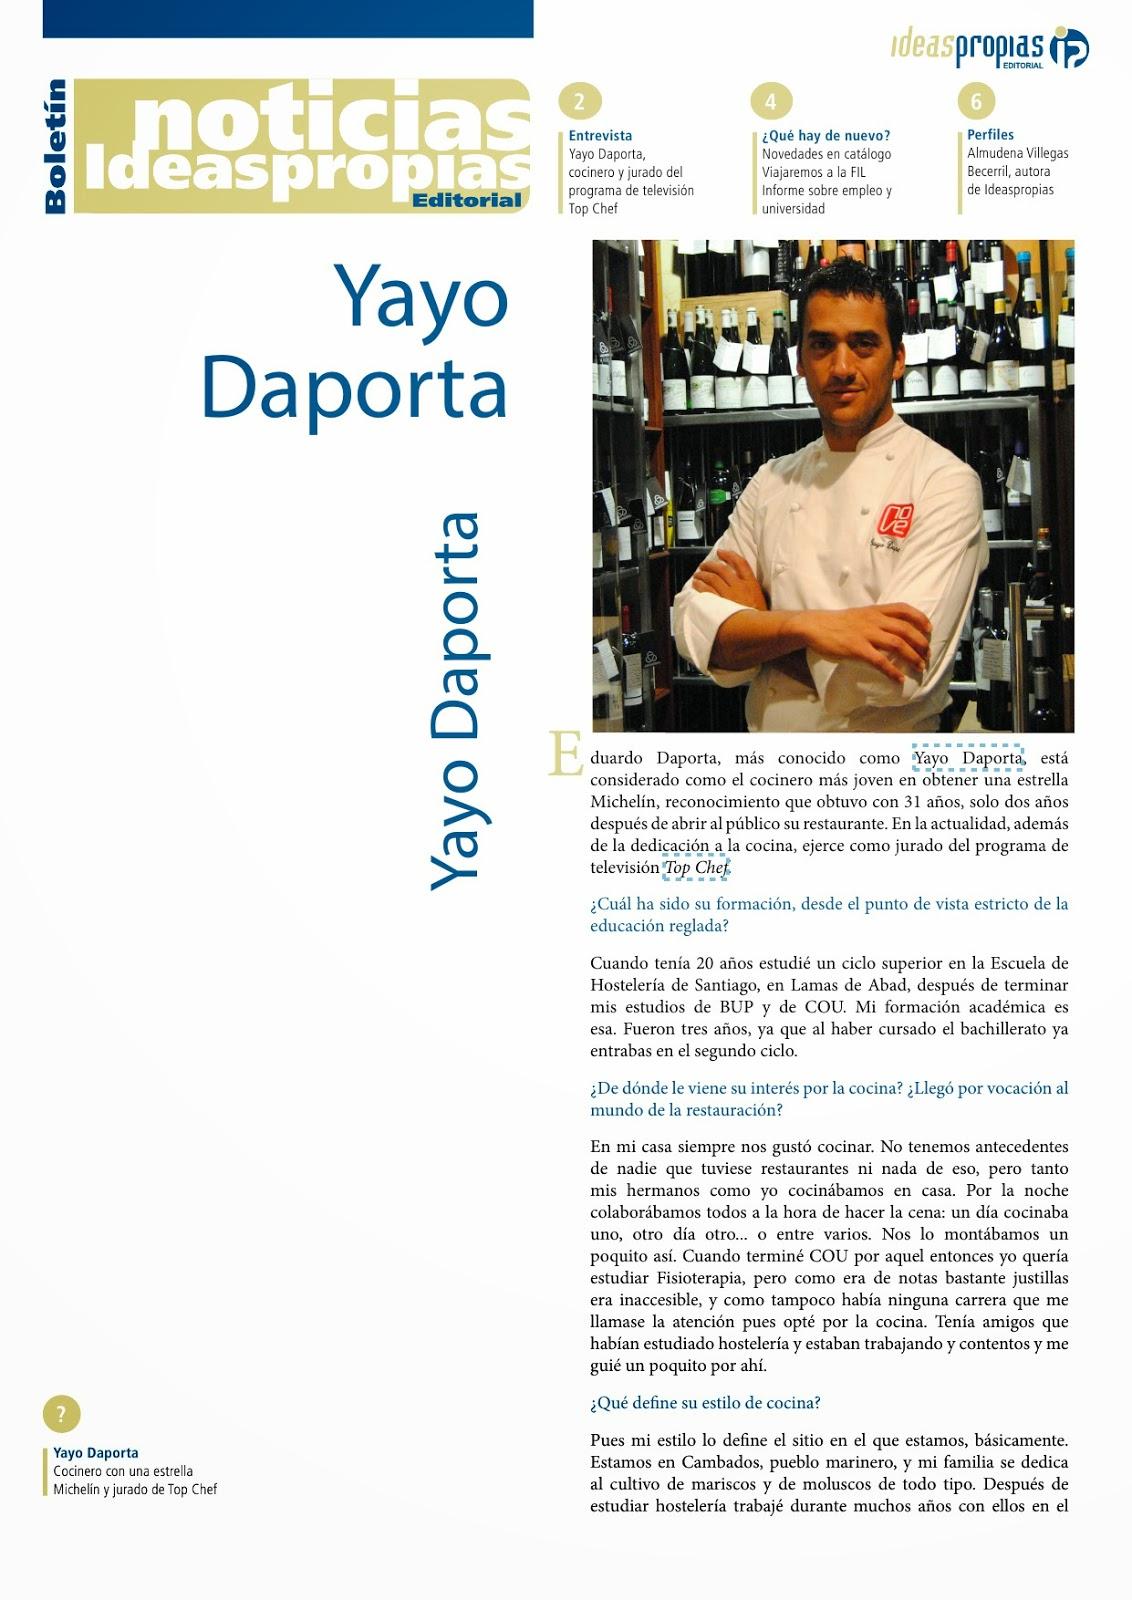 http://www.ideaspropiaseditorial.com/documentos_web/documentos/Boletin21.pdf